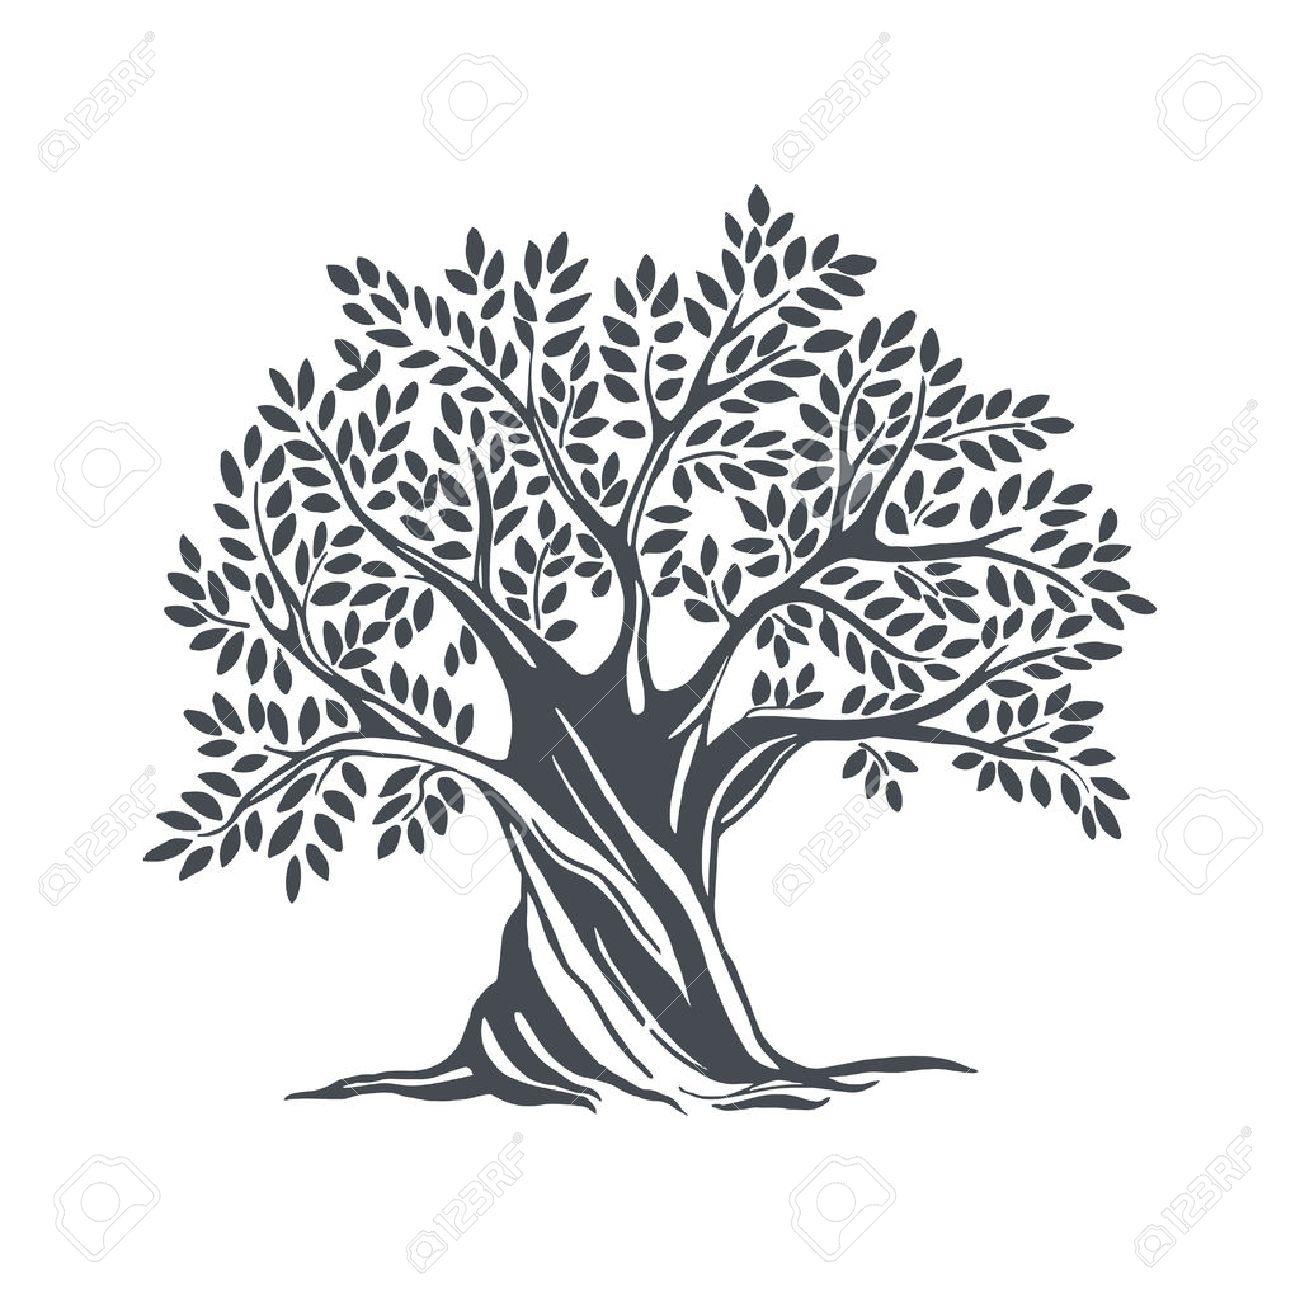 Hand drawn olive tree. Vector sketch illustration - 69775119